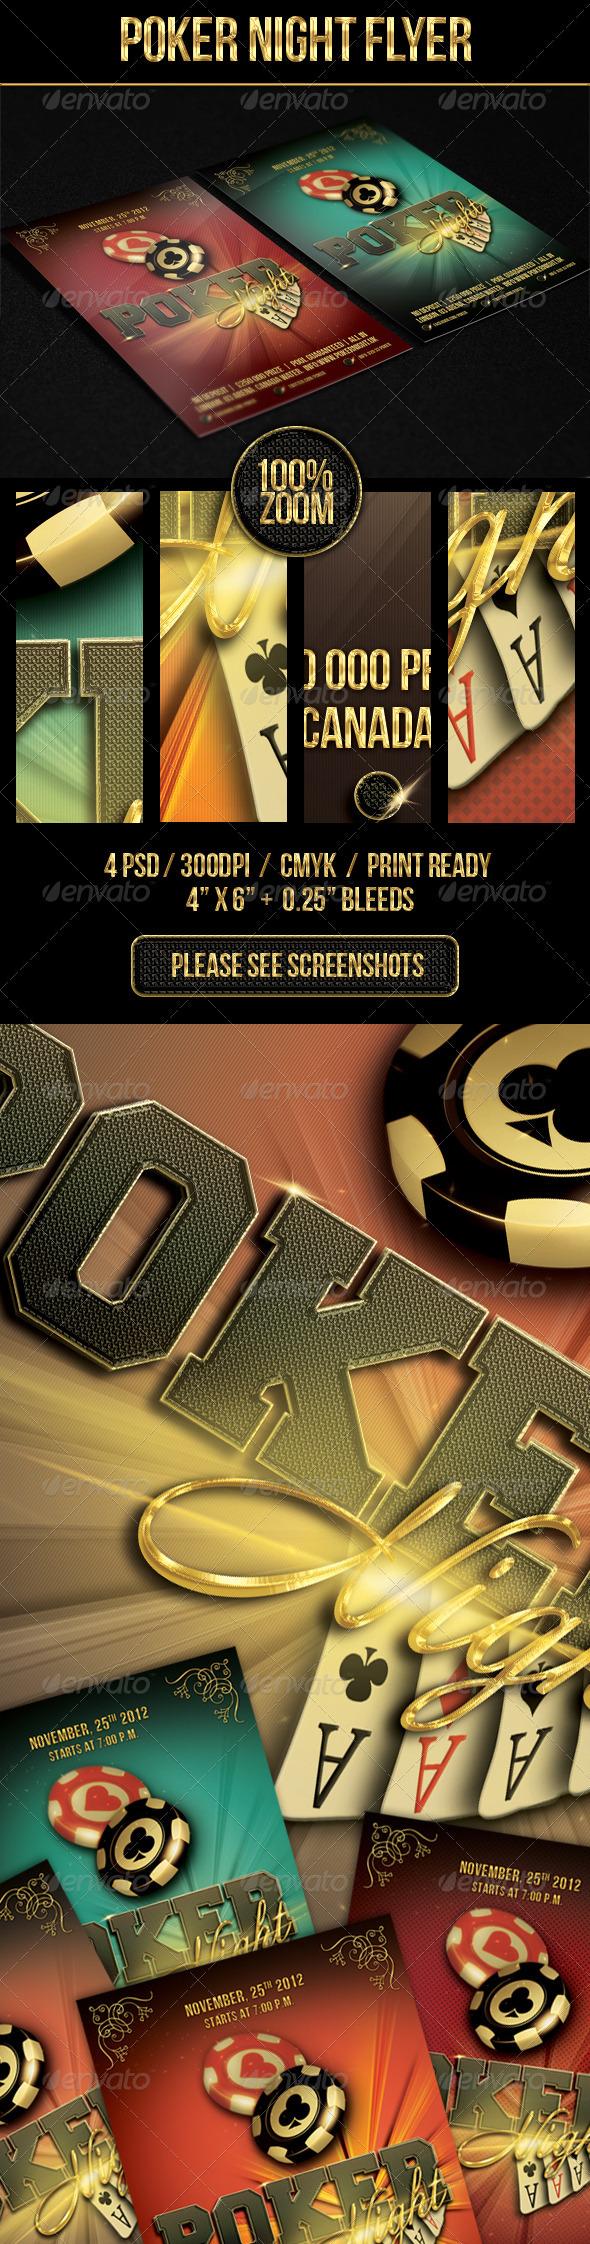 Poker Night Flyer Template 4 x 6